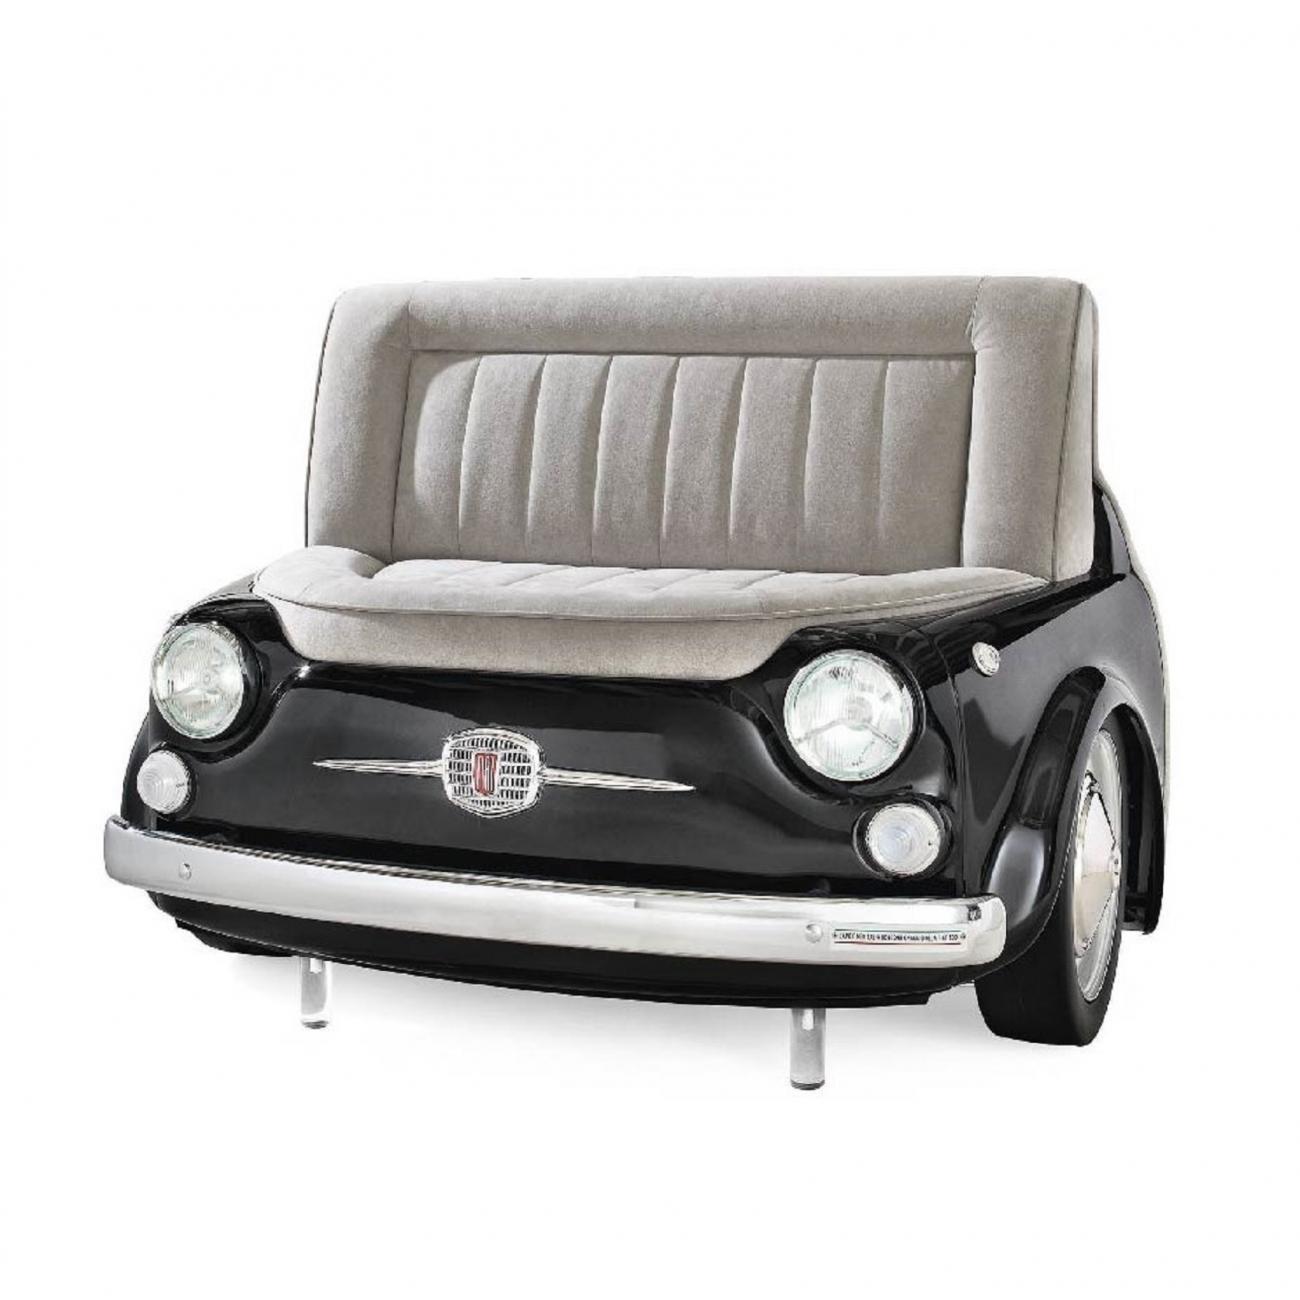 Meritalia fiat 500 panorama divano tattahome - Fiat 500 divano ...